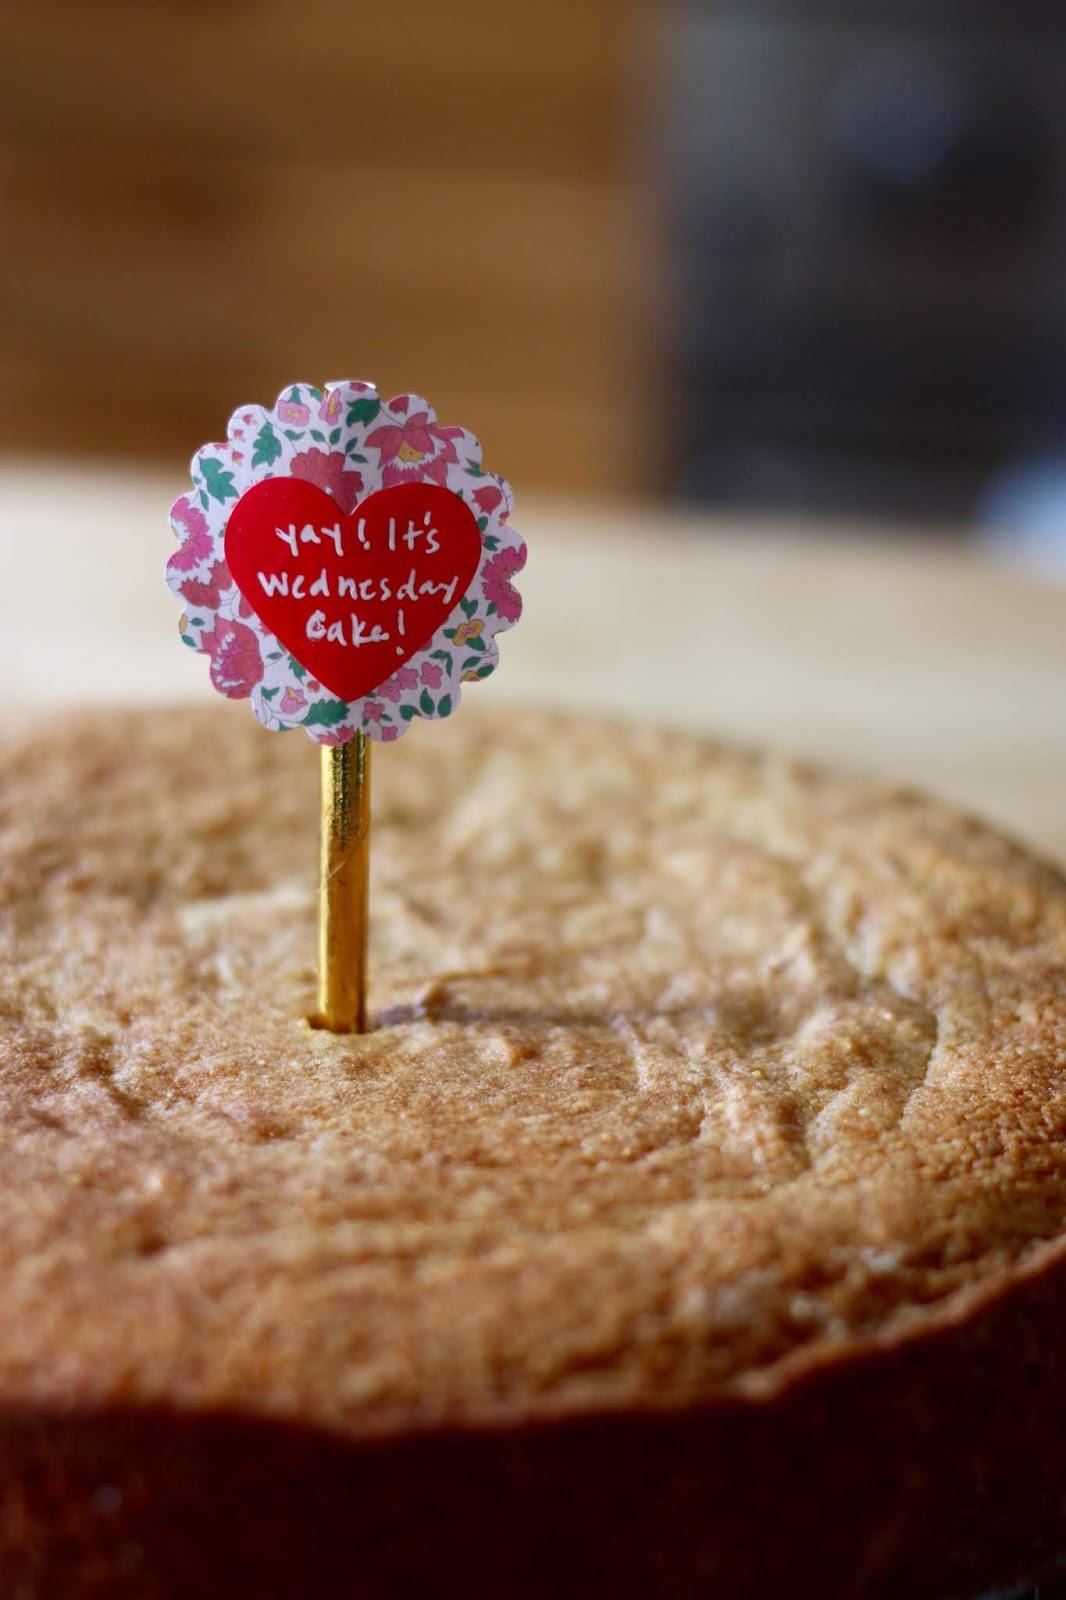 ben and birdy: Gluten-Free Yay It's Wednesday Cake! Donut Cake